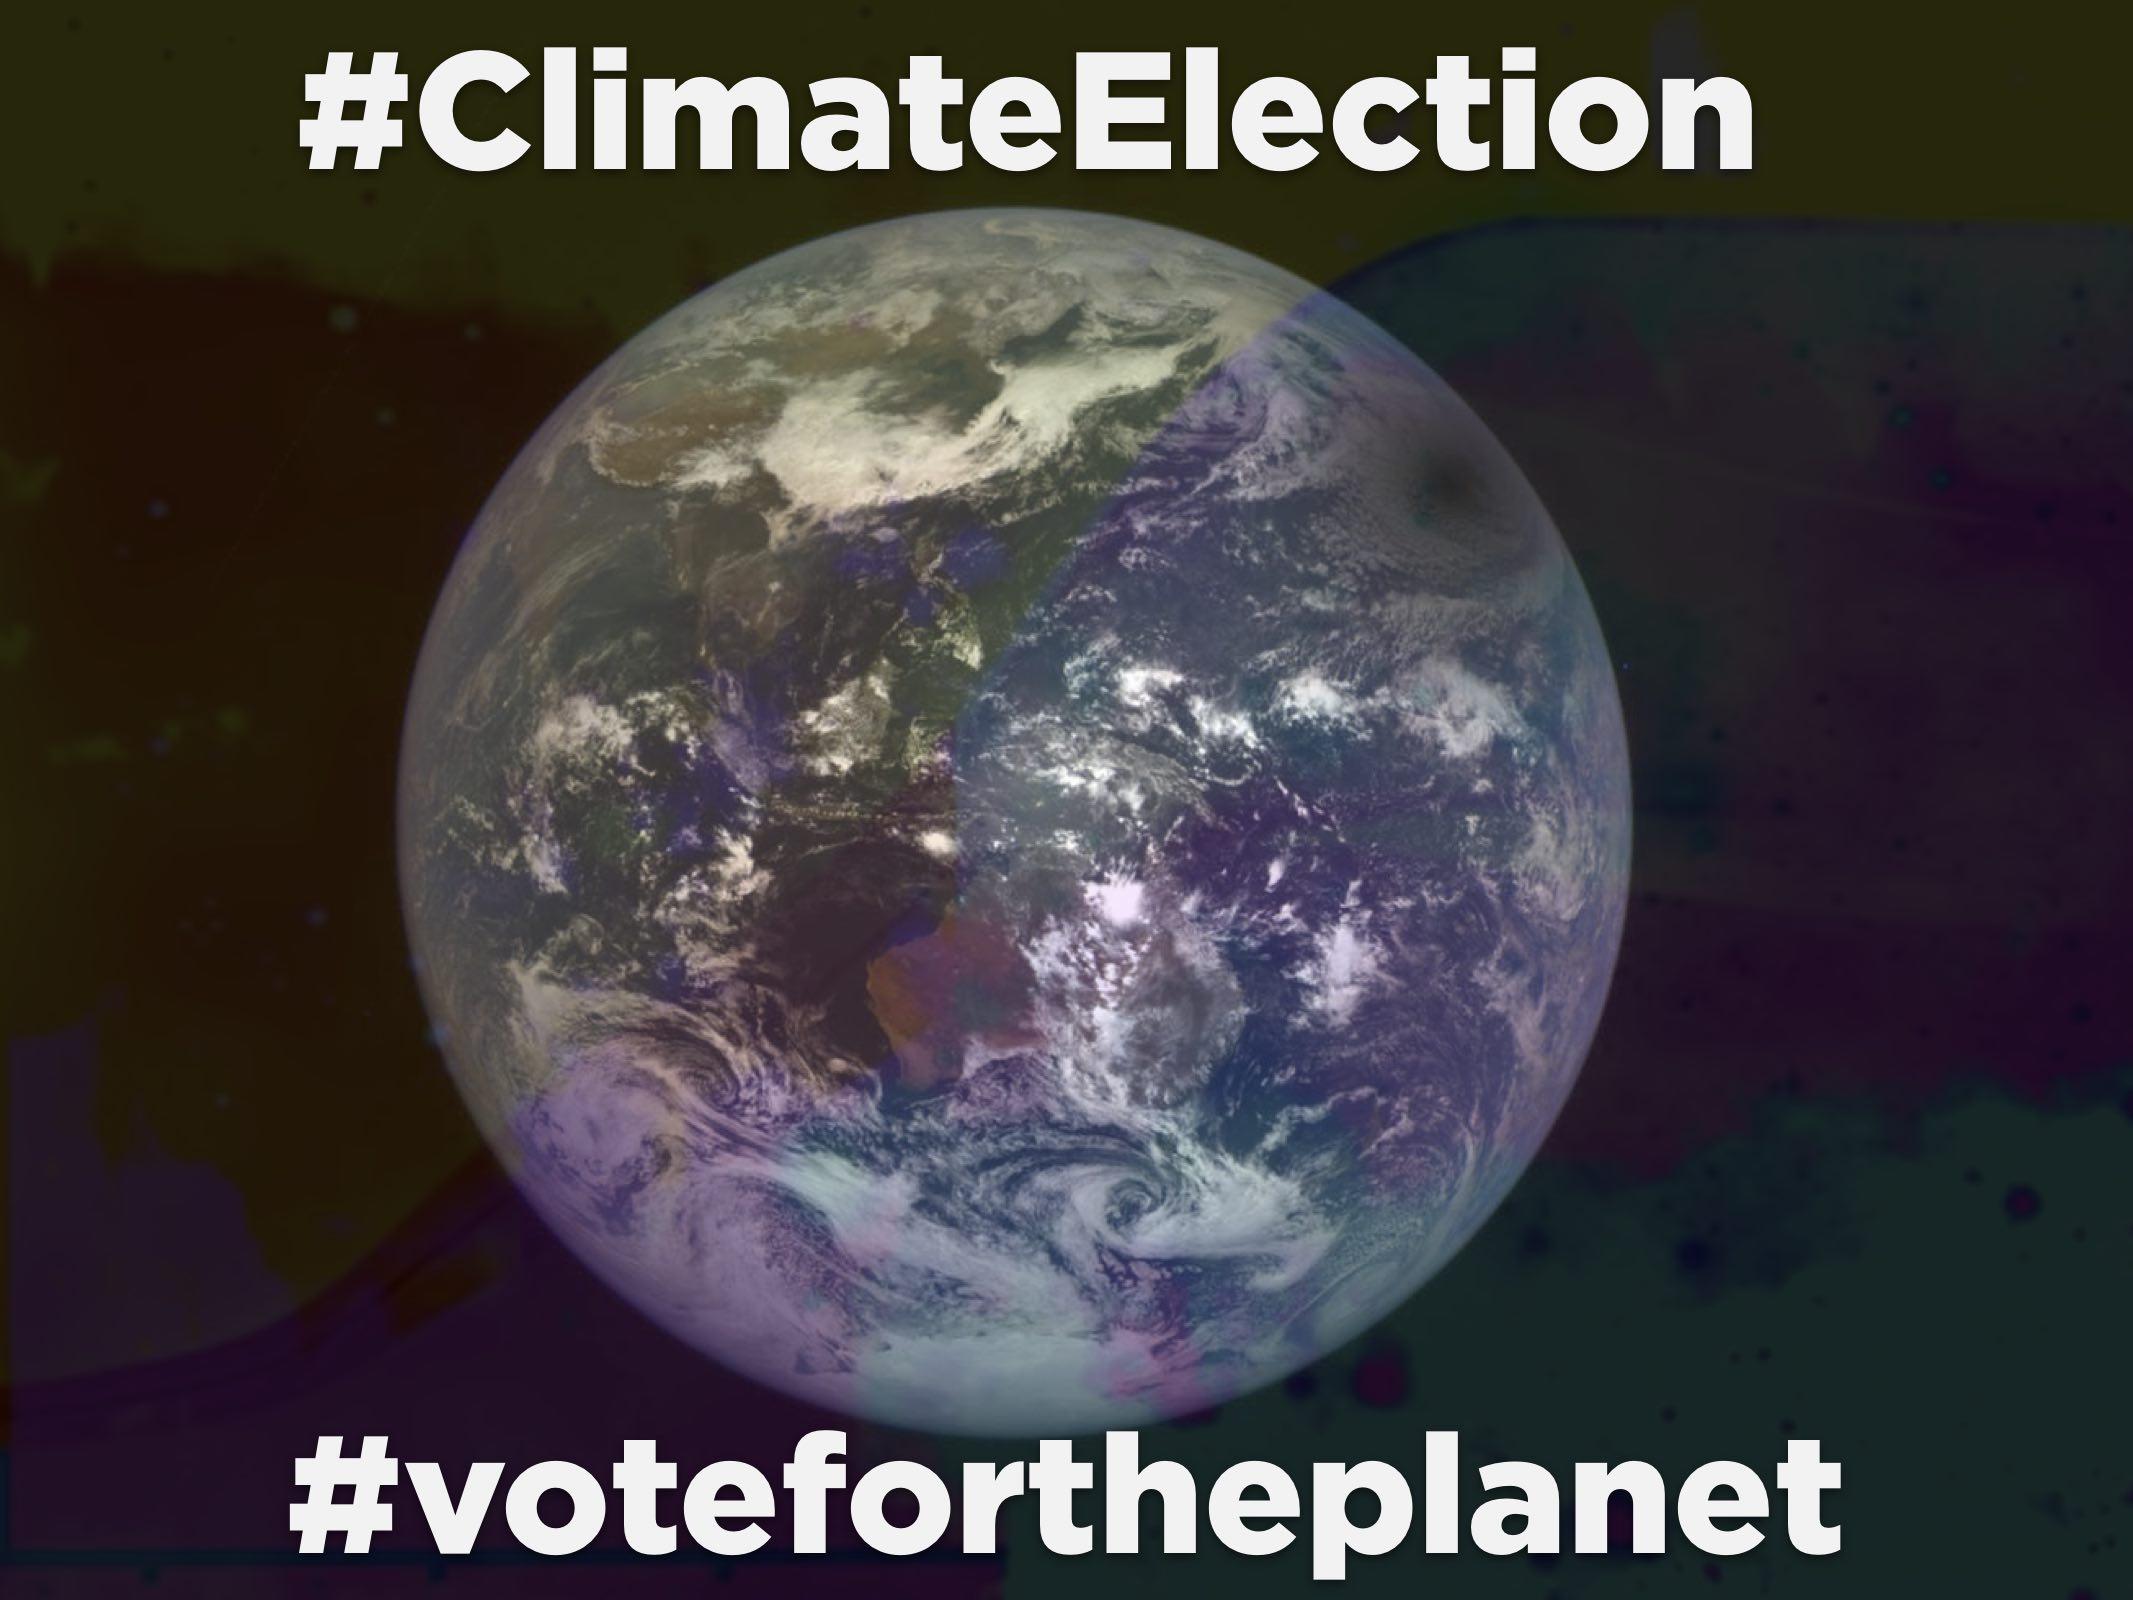 Climate-Election-slide (1) copy.jpg